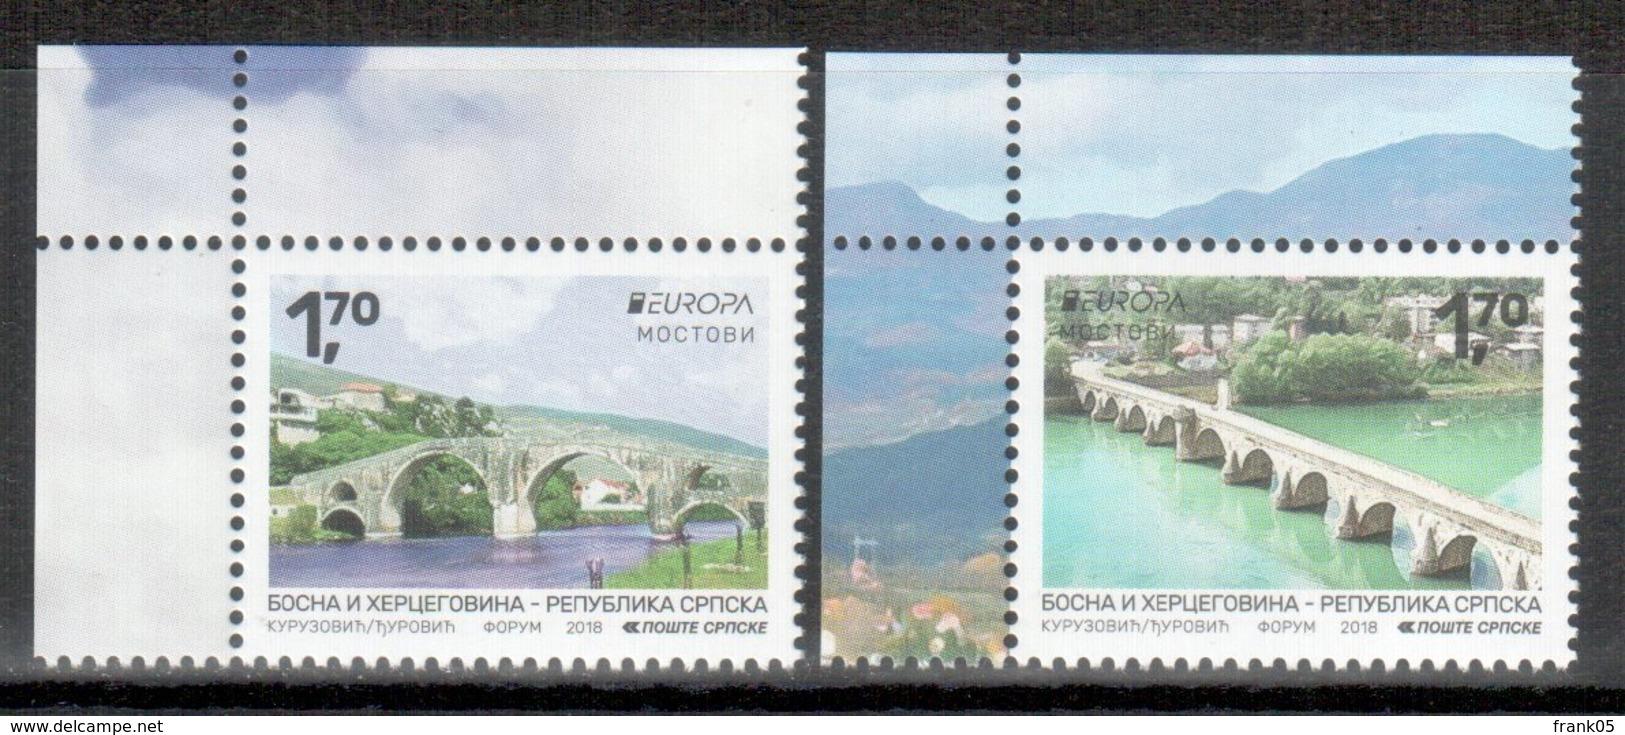 Bosnien-Herzegowina (serbisch) / Bosnia-Herzegowina (serbian Post) / Bosnie-Herzégovine 2018 Satz/set EUROPA ** - 2018